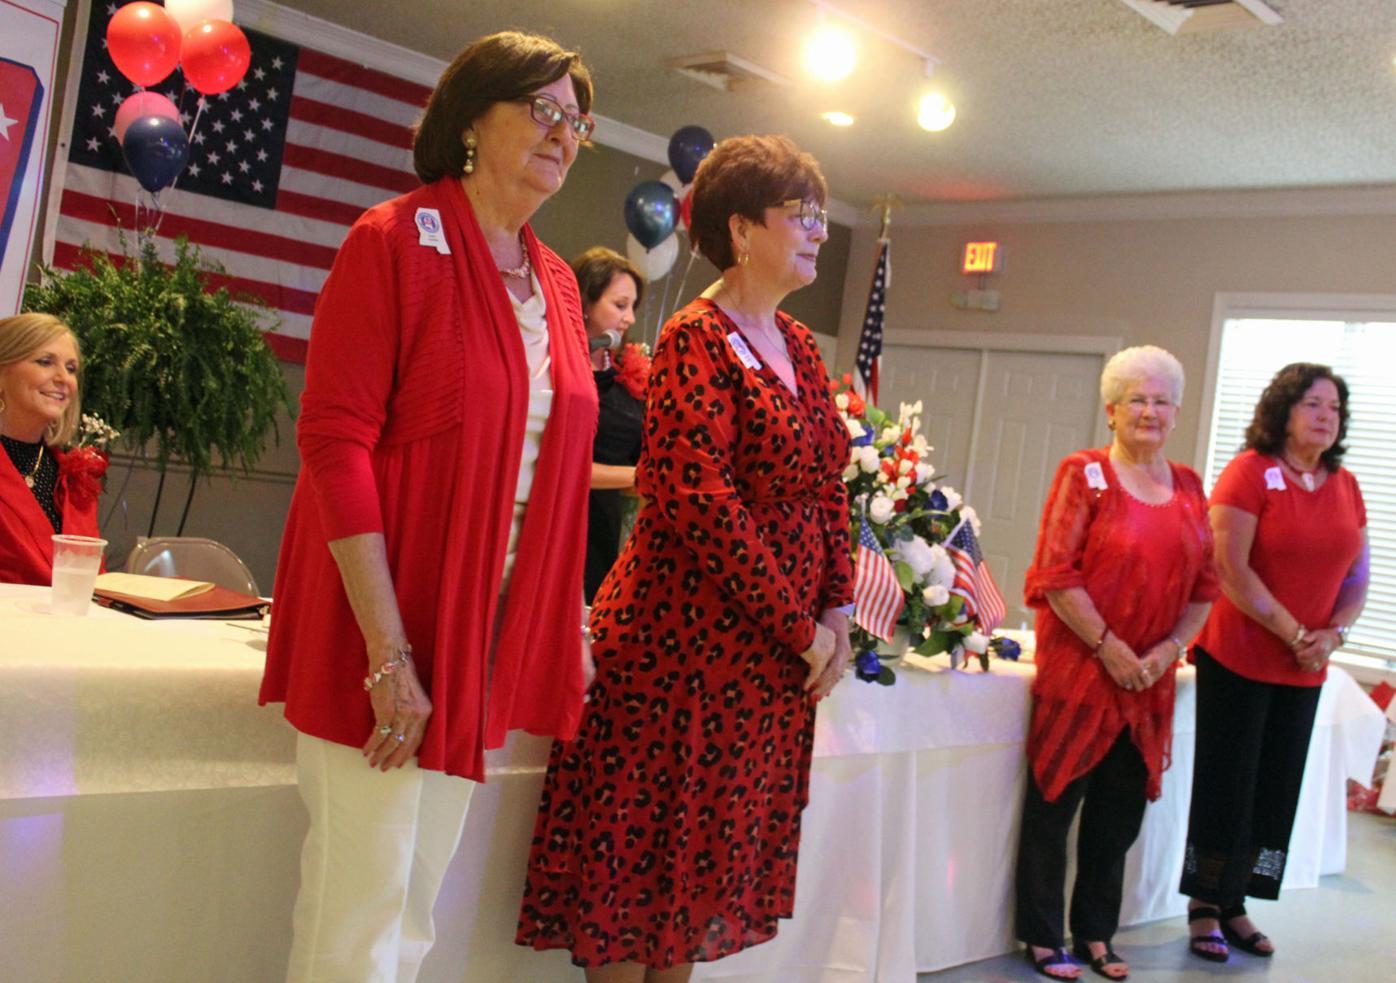 mcj-2021-08-25-news-republican-women-charter-main.jpg